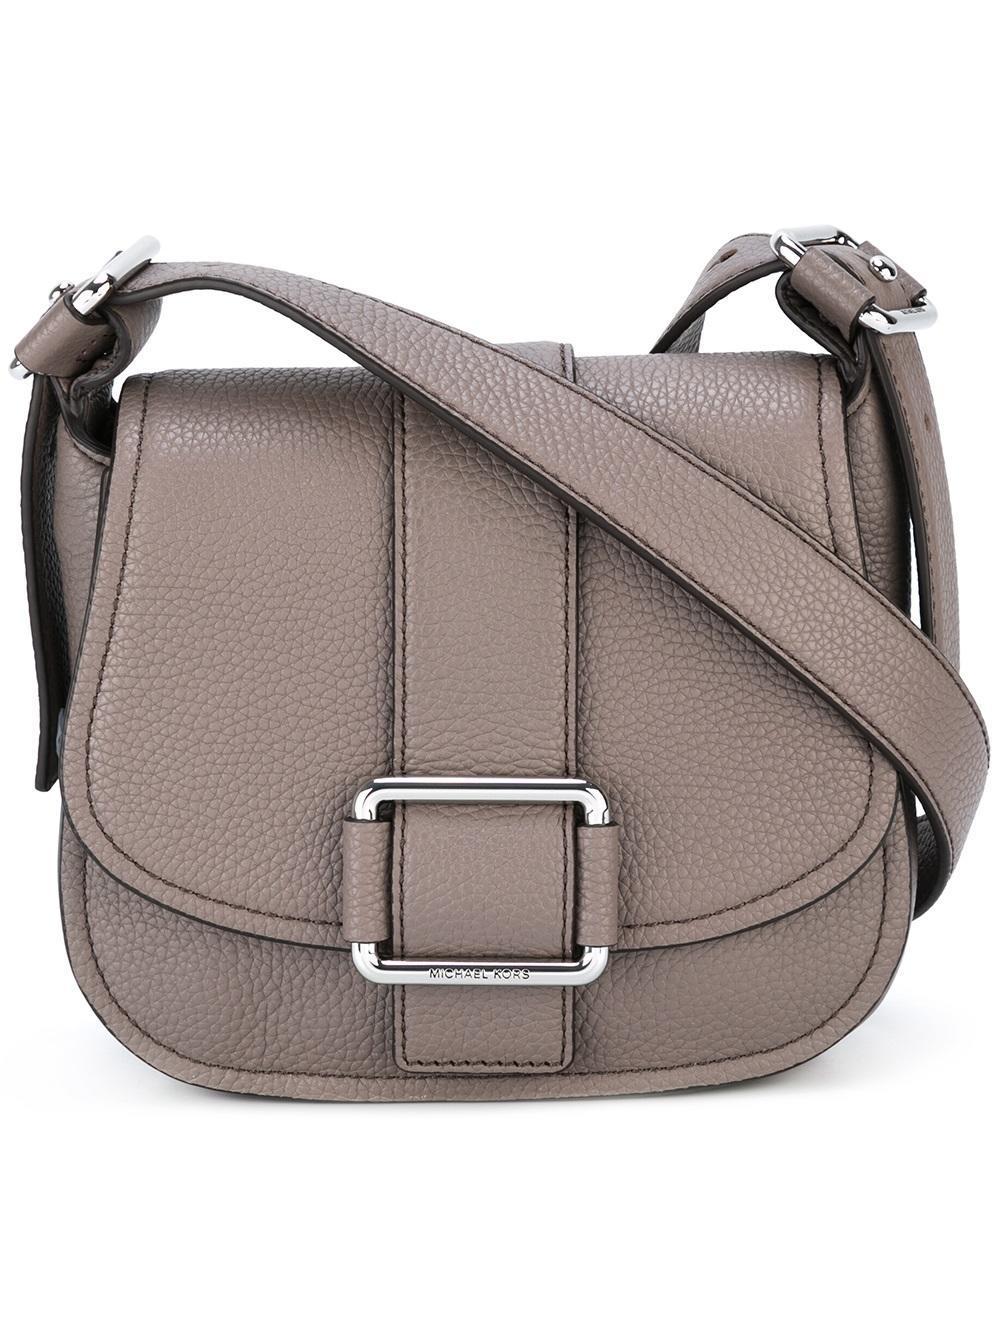 131c9793cd7b92 MICHAEL Michael Kors Maxine Saddle Crossbody Bag in Gray - Lyst